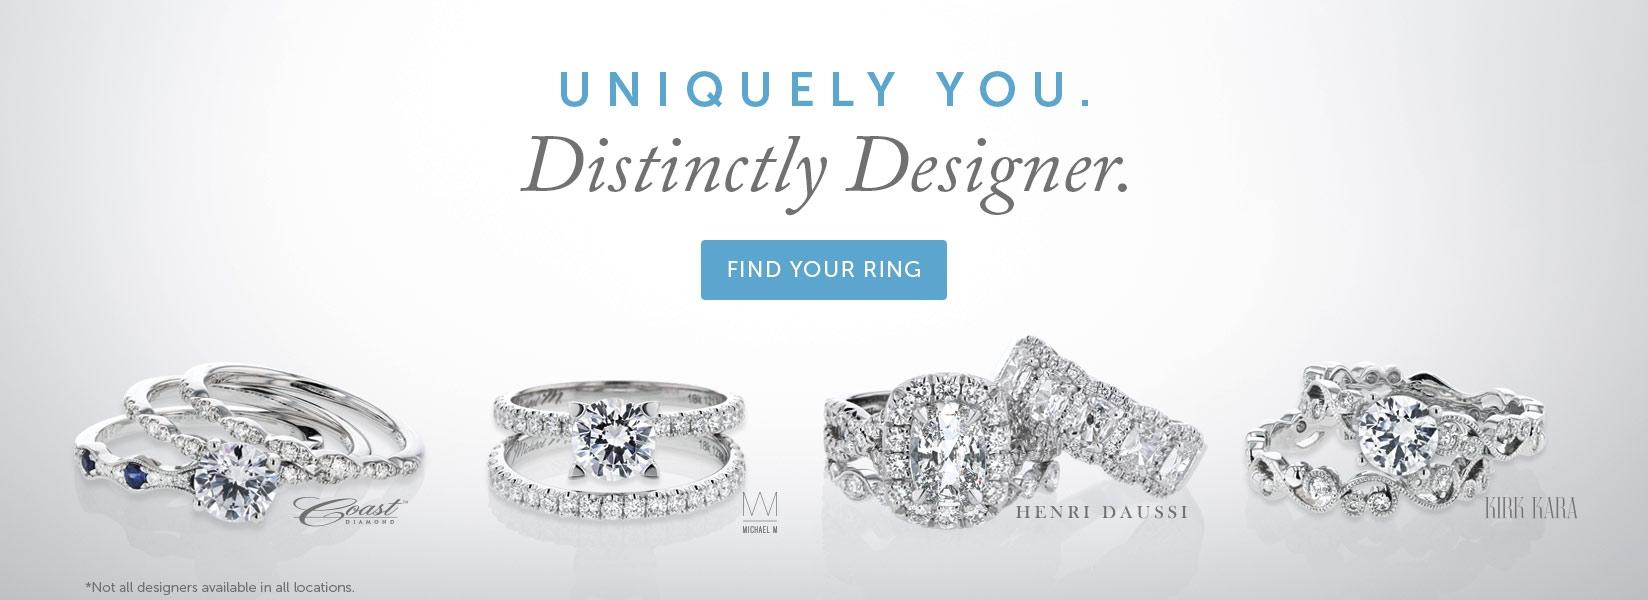 Uniquely You, Distinctly Designer.